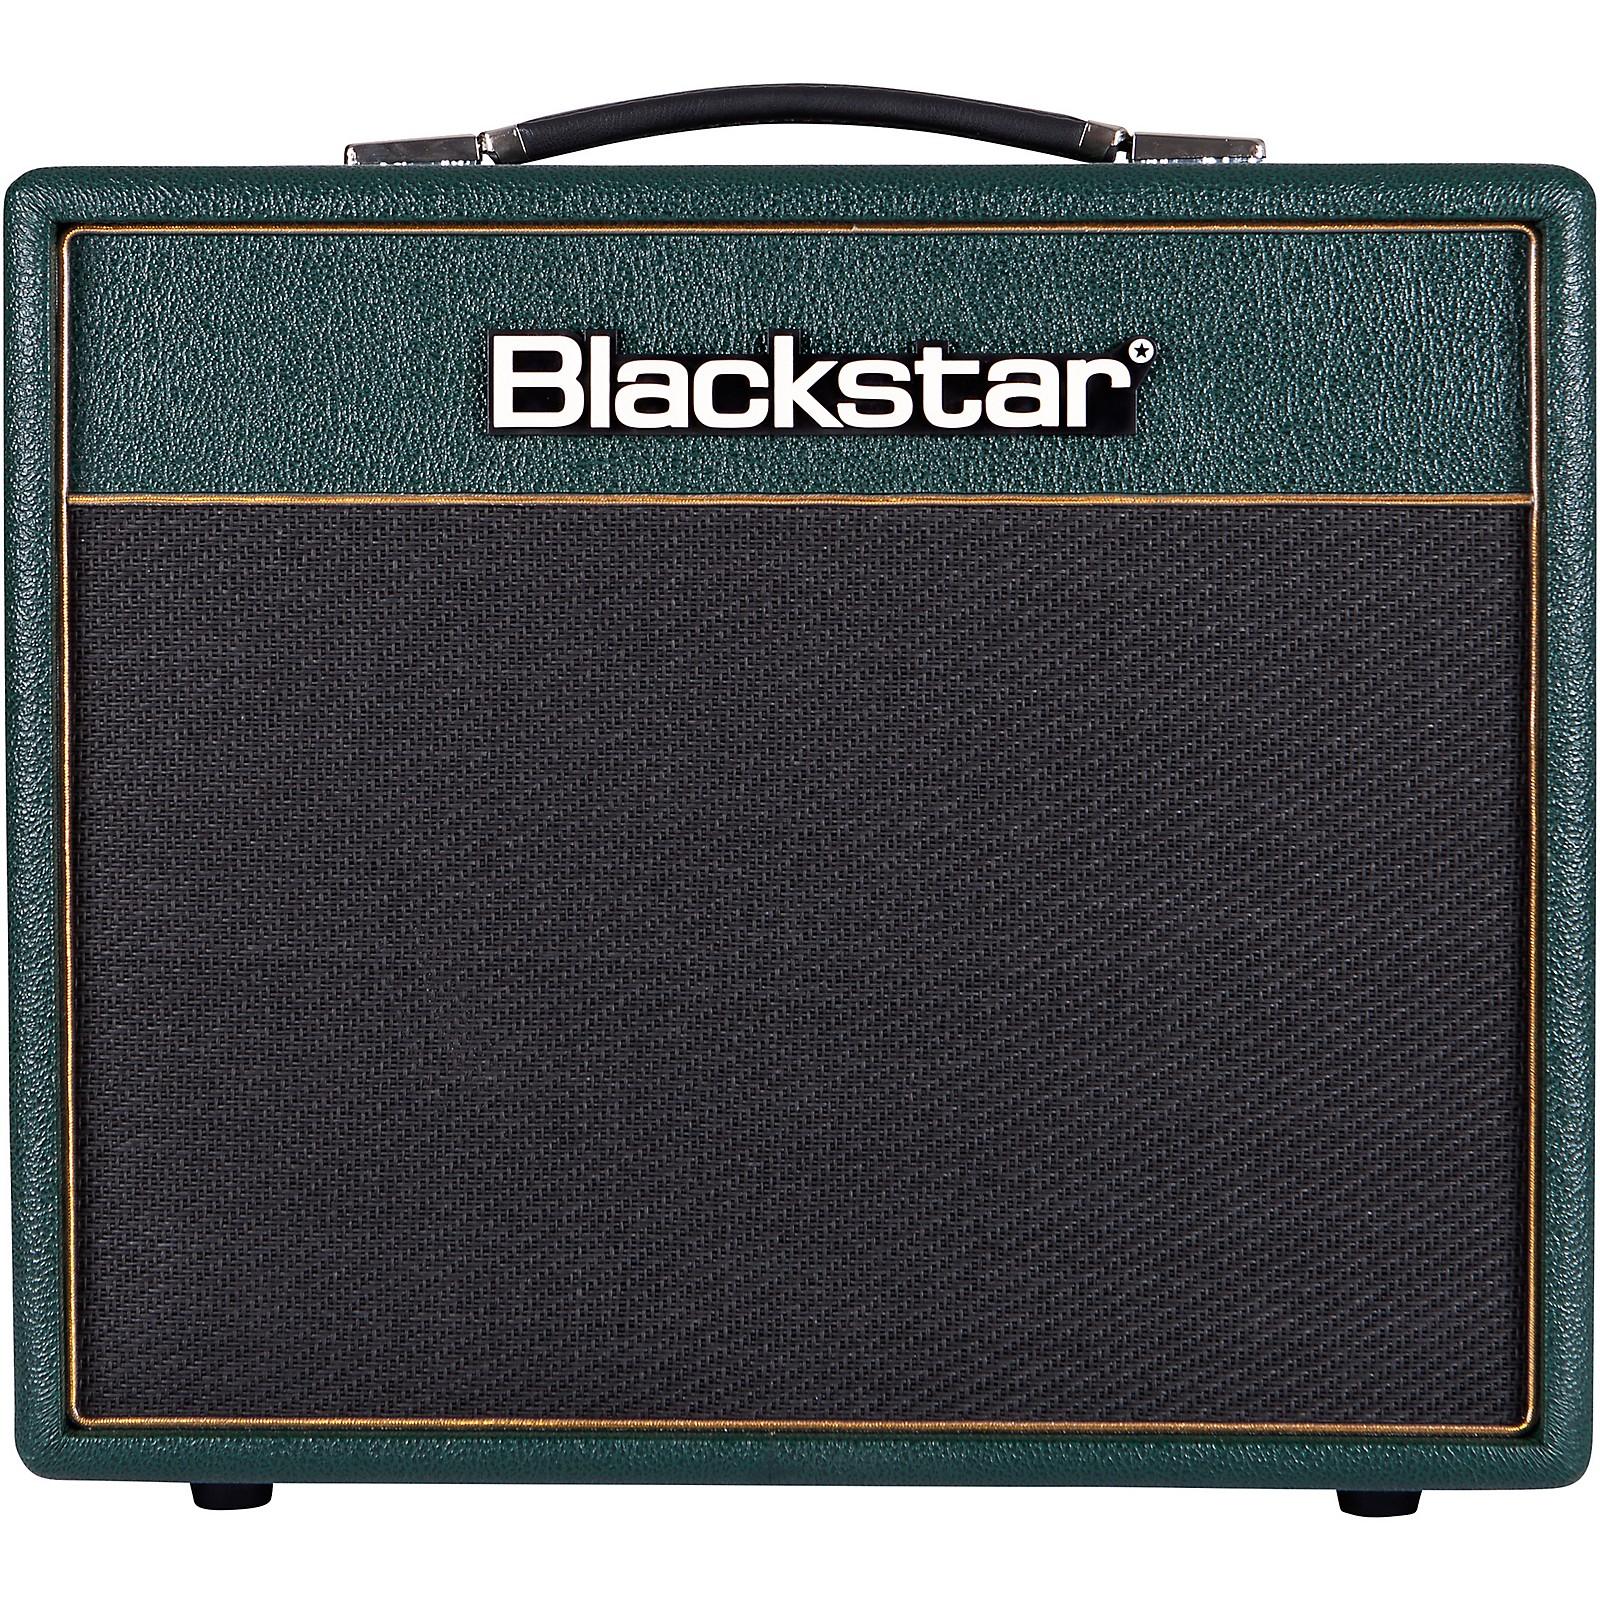 Blackstar Special Edition Studio 10 KT88 10W 1x12 Tube Guitar Amp Combo